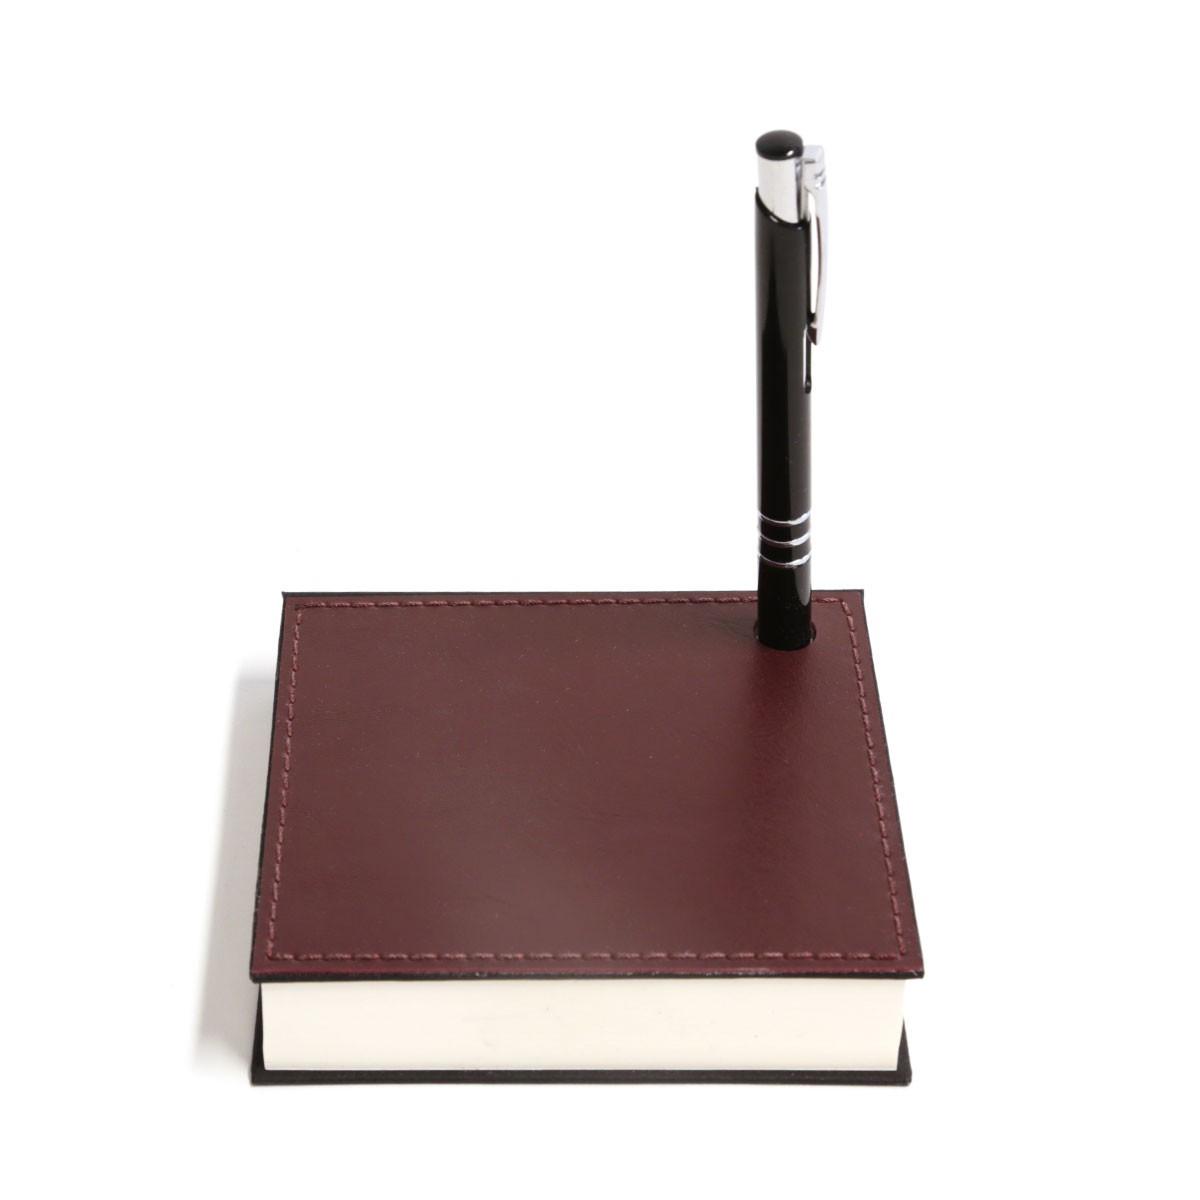 Mini bloco com caneta (Montana Bordô)